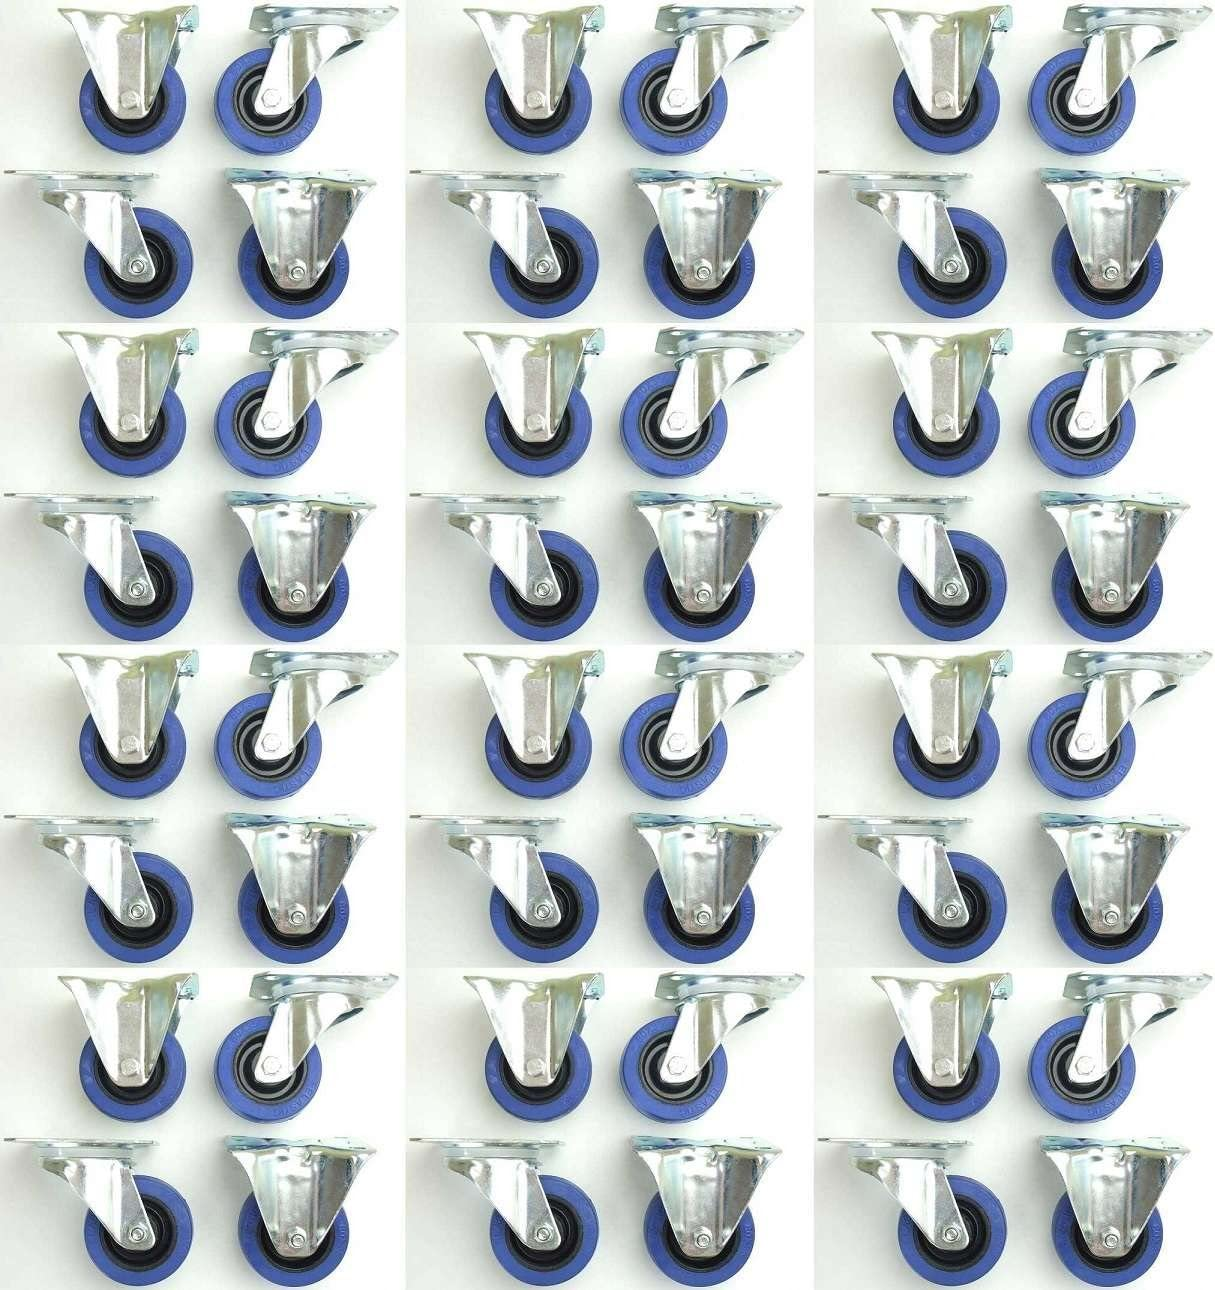 INDUSTRIEQALIT/ÄT 1 Satz 80mm Blue Wheels Lenkrollen Transportrollen mit Feststellbremse 2x Brems + 2x Bock Bockrollen 140kg // Rad